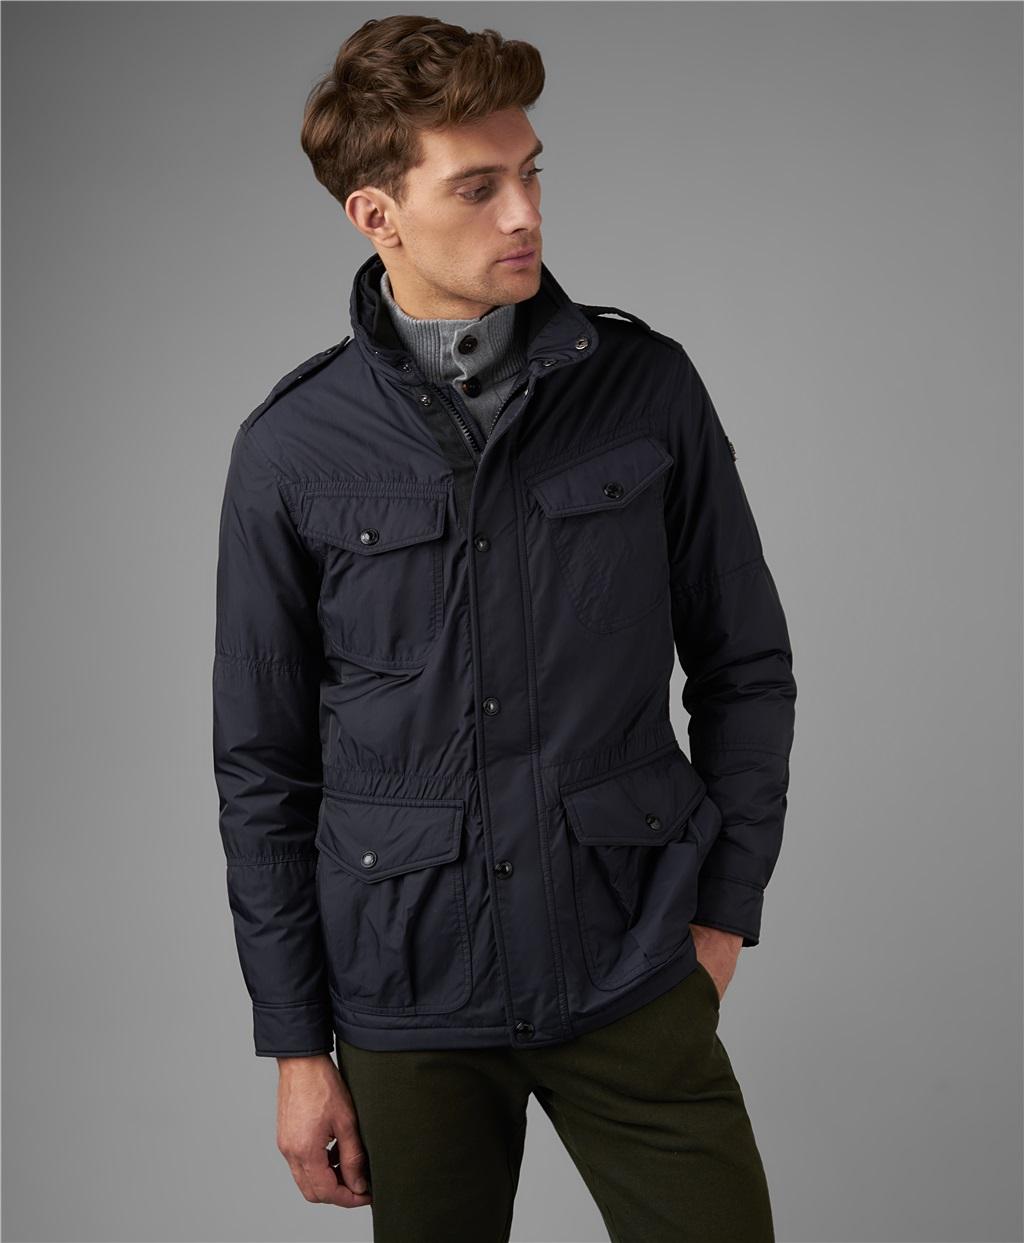 Куртка мужская HENDERSON JK-0273-1 синяя 52 RU, JK-0273-1